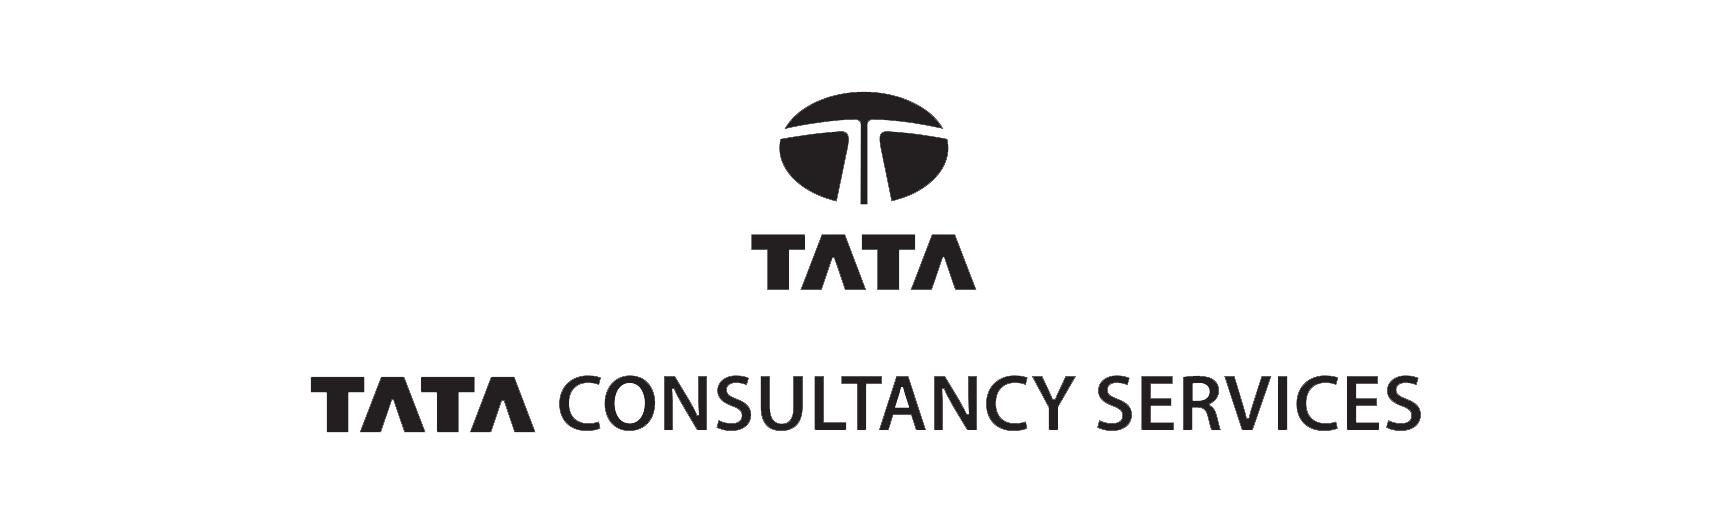 Tata Consultancy Services' Quartz DevKit Adds Ethereum, Now Supports Top 3 Blockchain Platforms